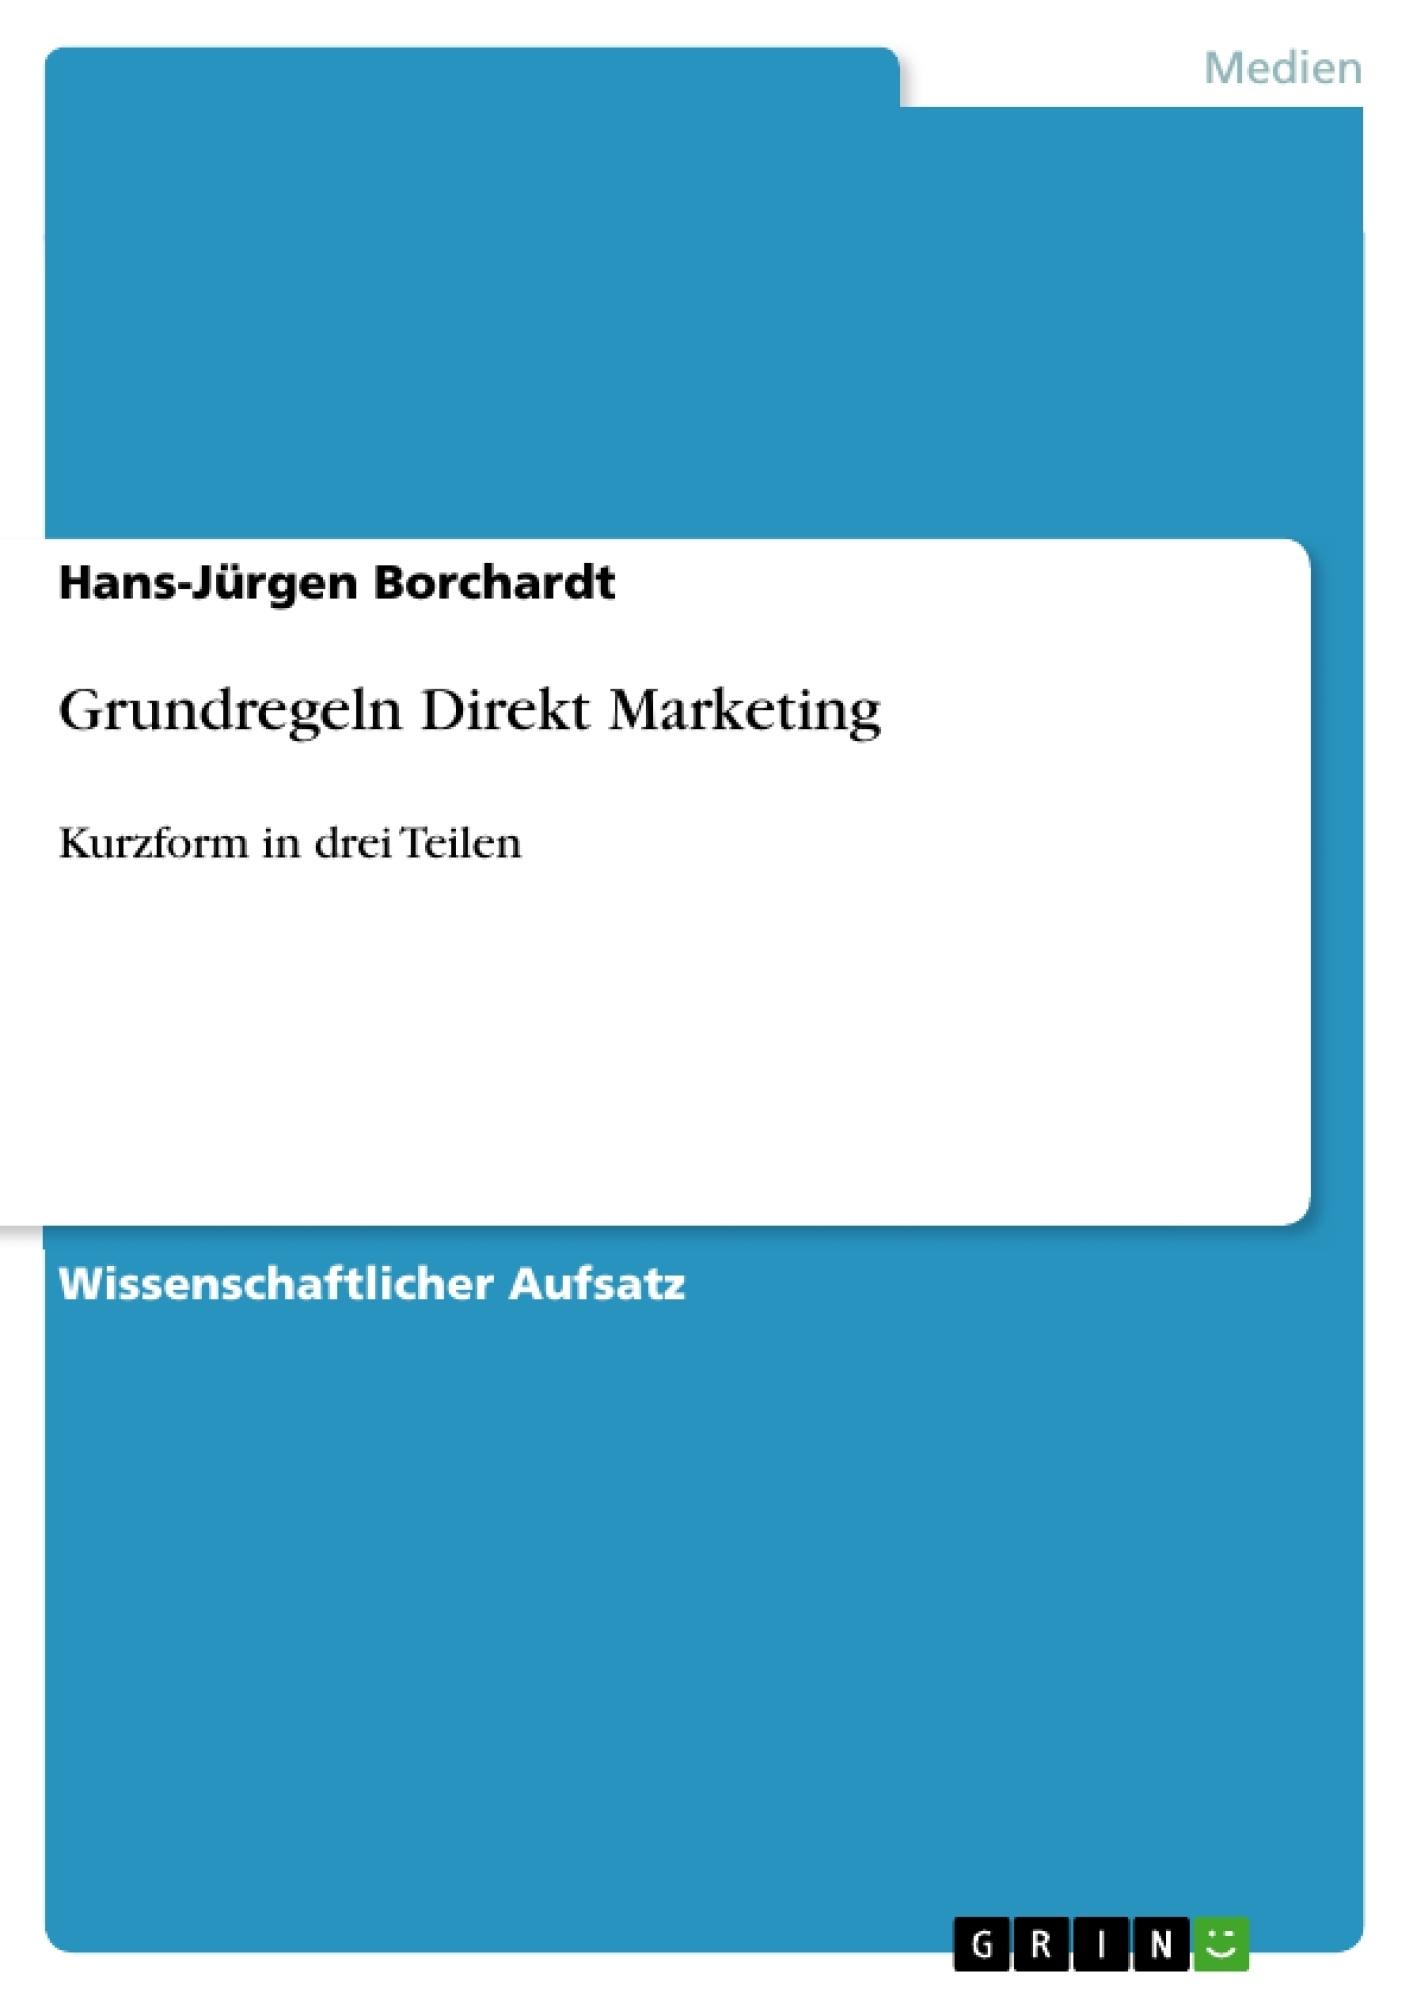 Titel: Grundregeln Direkt Marketing